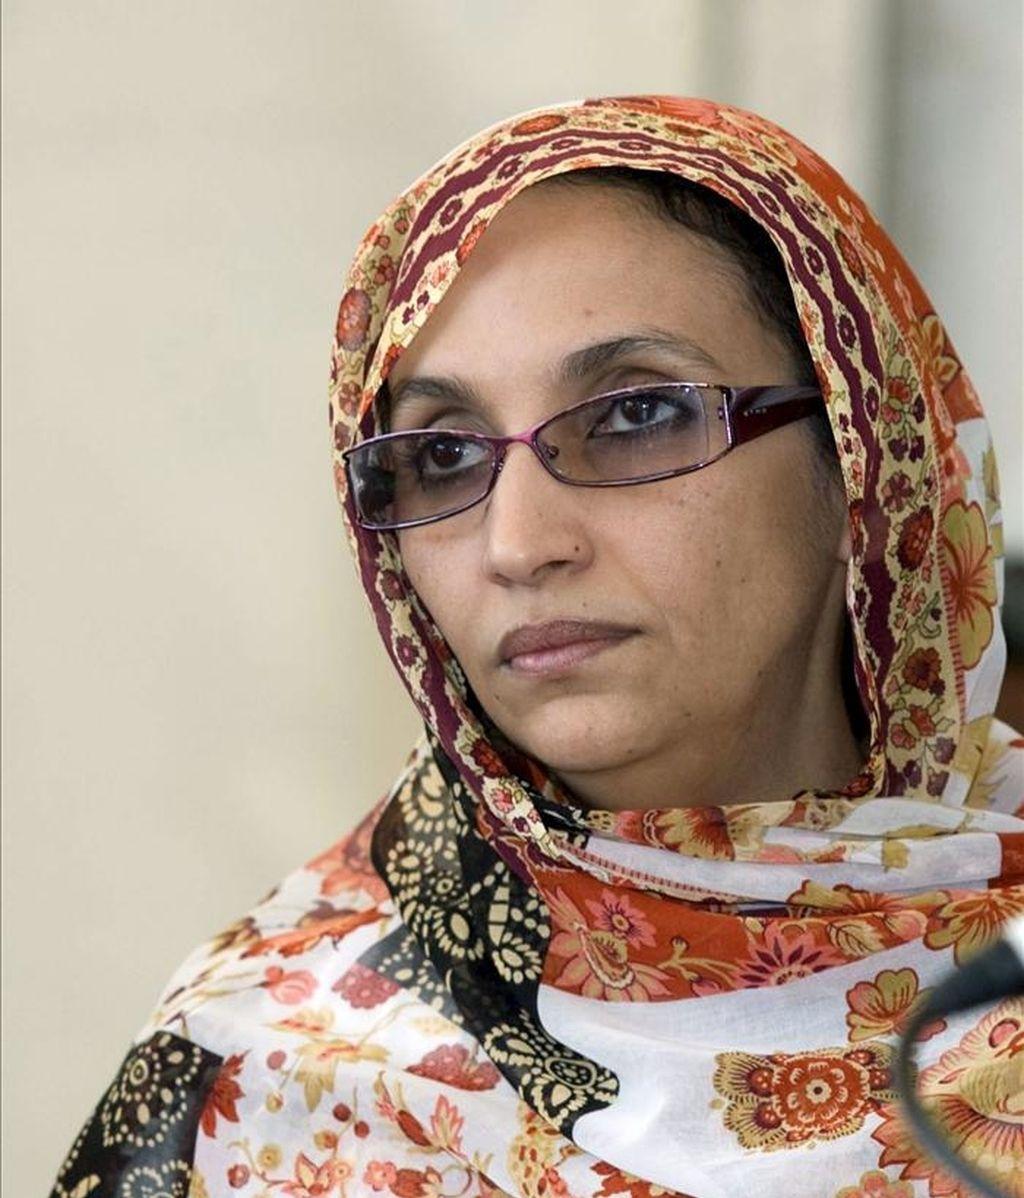 La activista saharaui Aminatu Haidar. EFE/Archivo